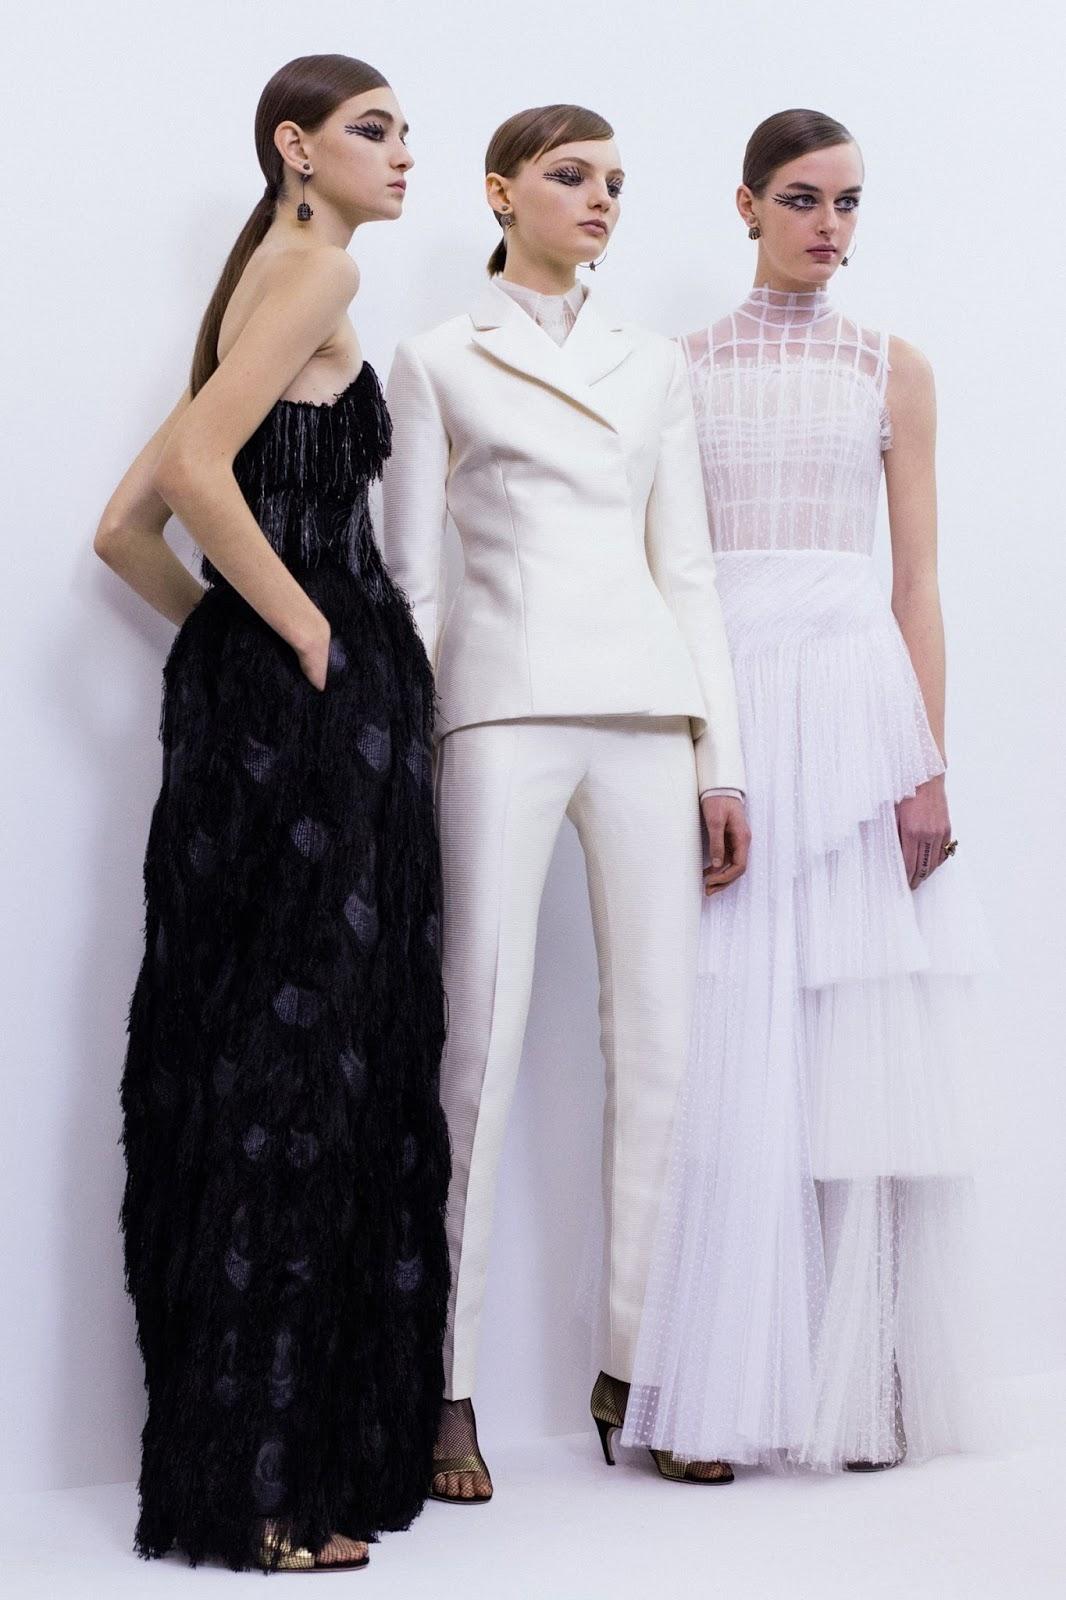 dior-couture-ss18, dior-haute-couture-ss18, dior-couture, Maria-Grazia-Chiuri-dior, paris-fashion-week-2018, pfw2018, pfw-2018, pfw-18, défilé-haute-couture, haute-couture,dudessinauxpodiums